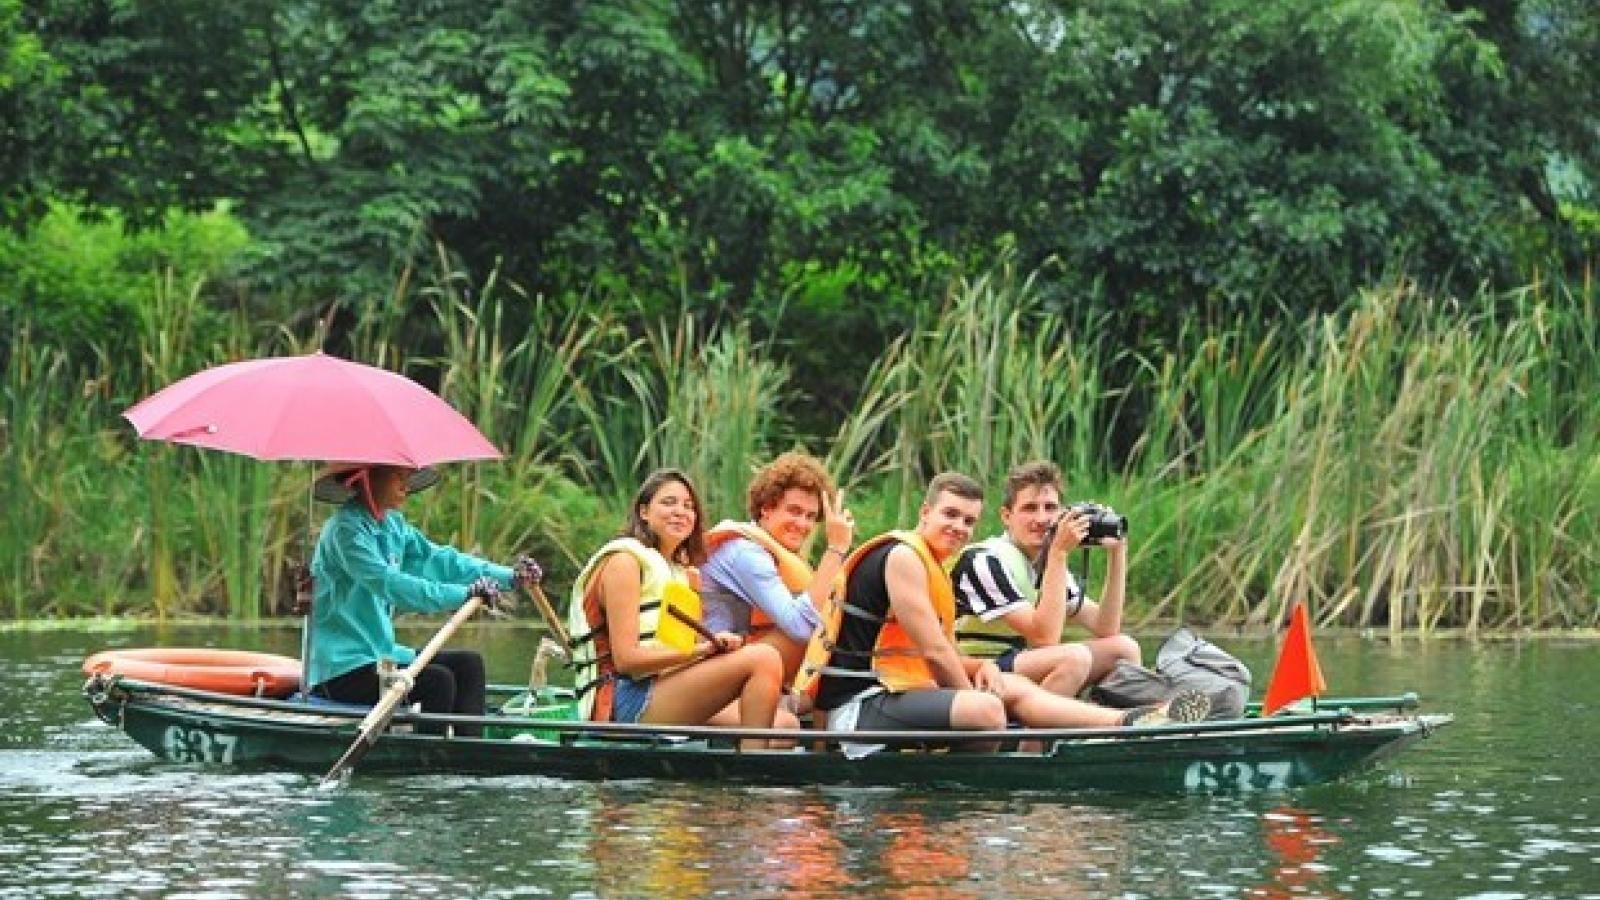 Tourism firms bolster digital transformation for long-term development